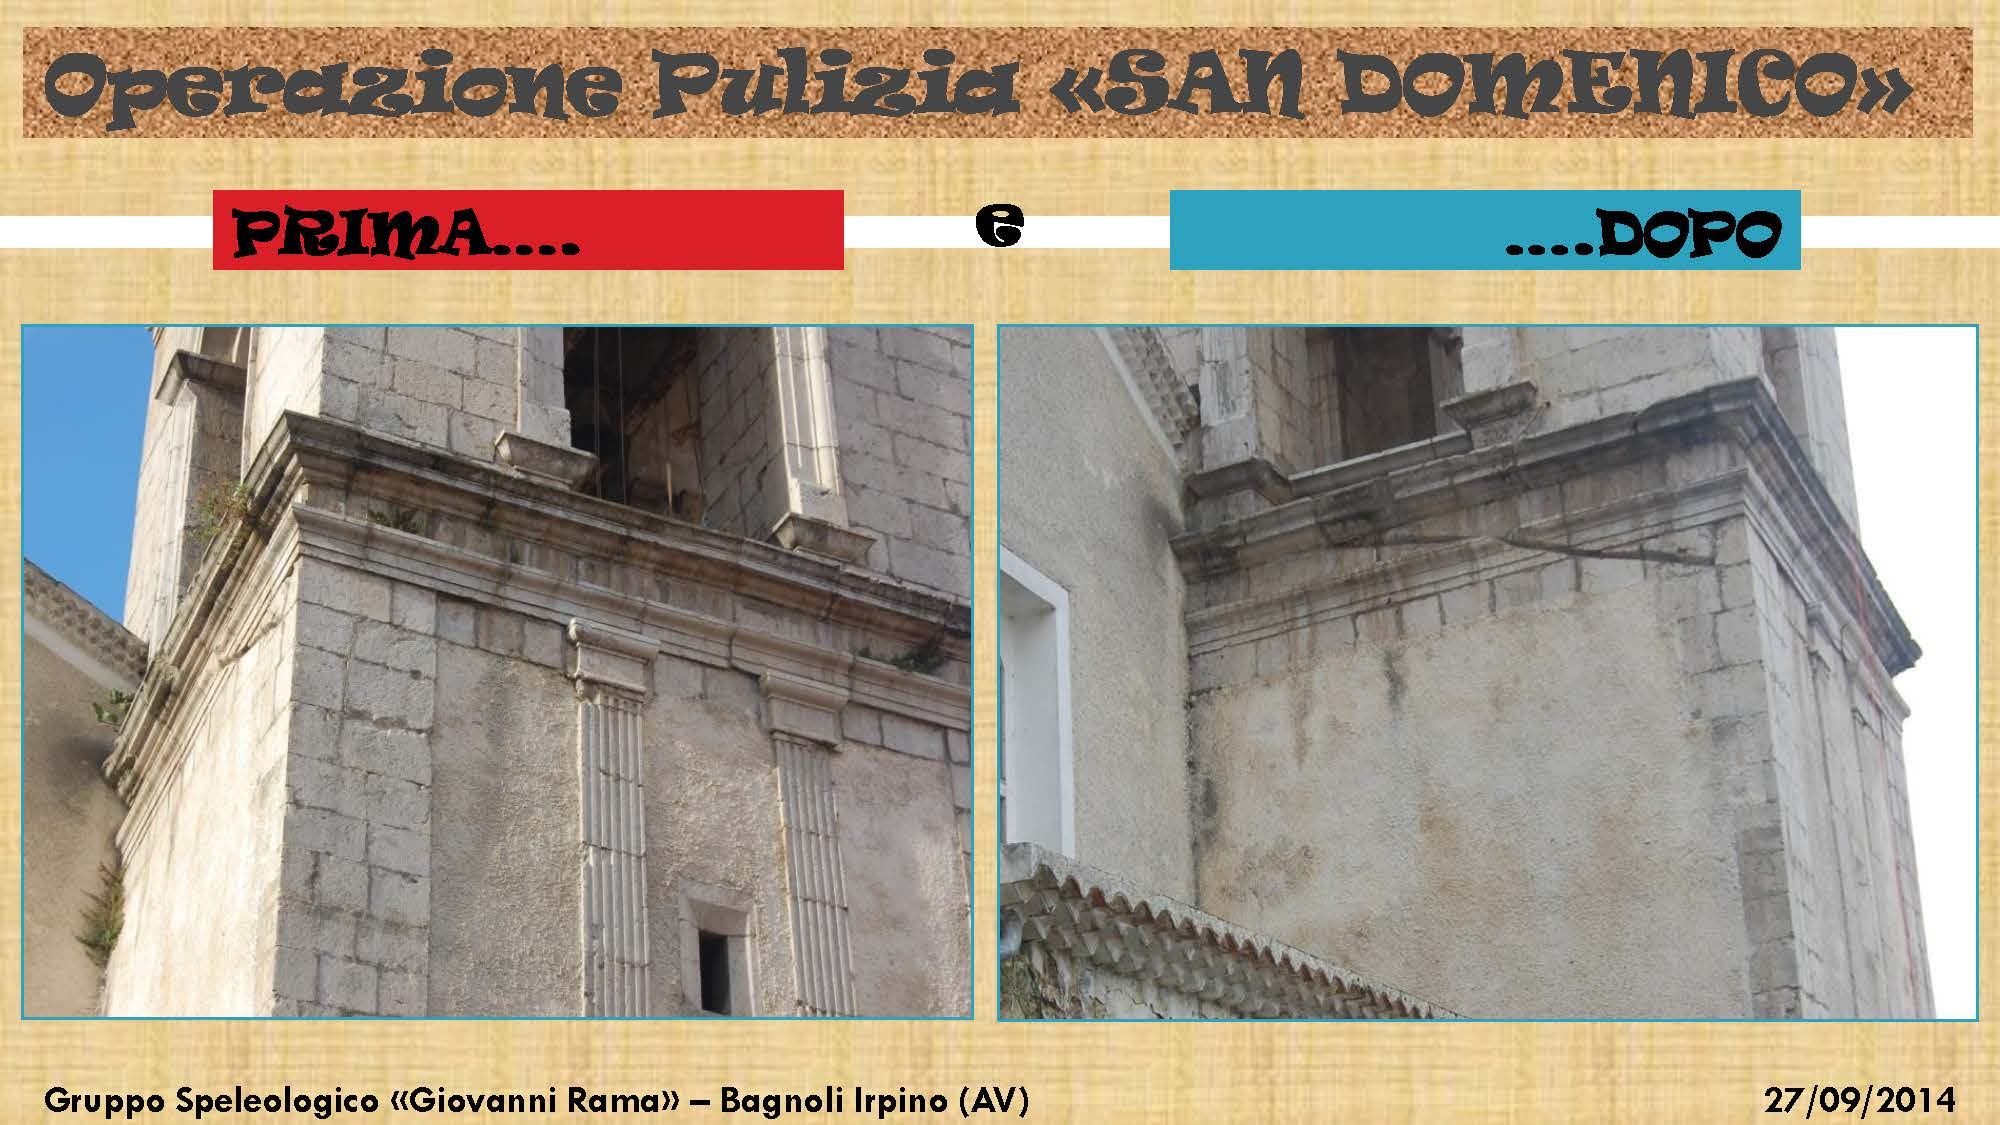 Bagnoli-Pulizia-San-Domenico-2014_Pagina_05